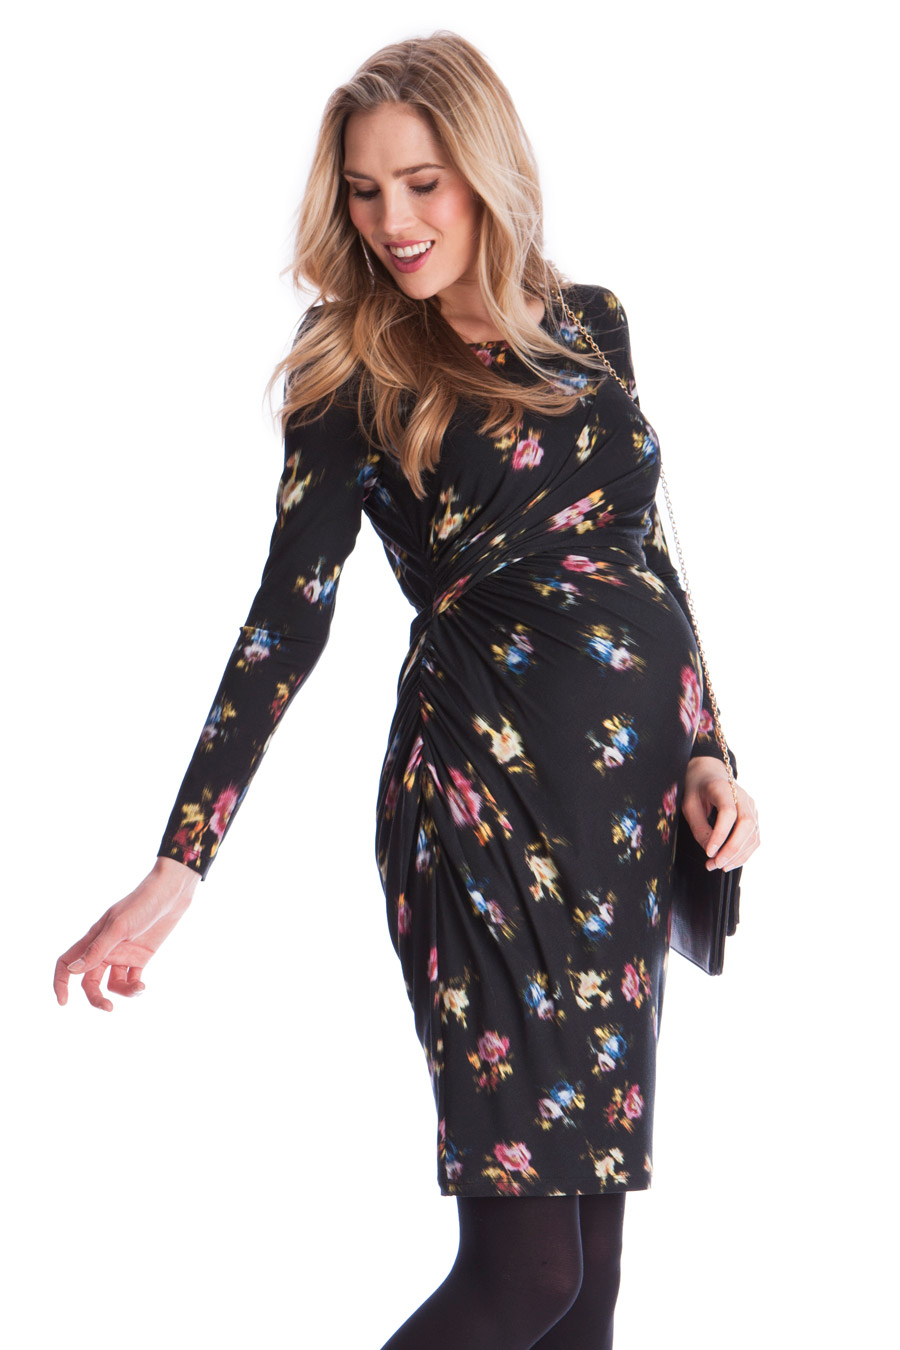 7584f88f760a8 Maternity and Nursing Dress with floral print   Nursing Dresses   Nursing  Wear   Mum   Mamarella